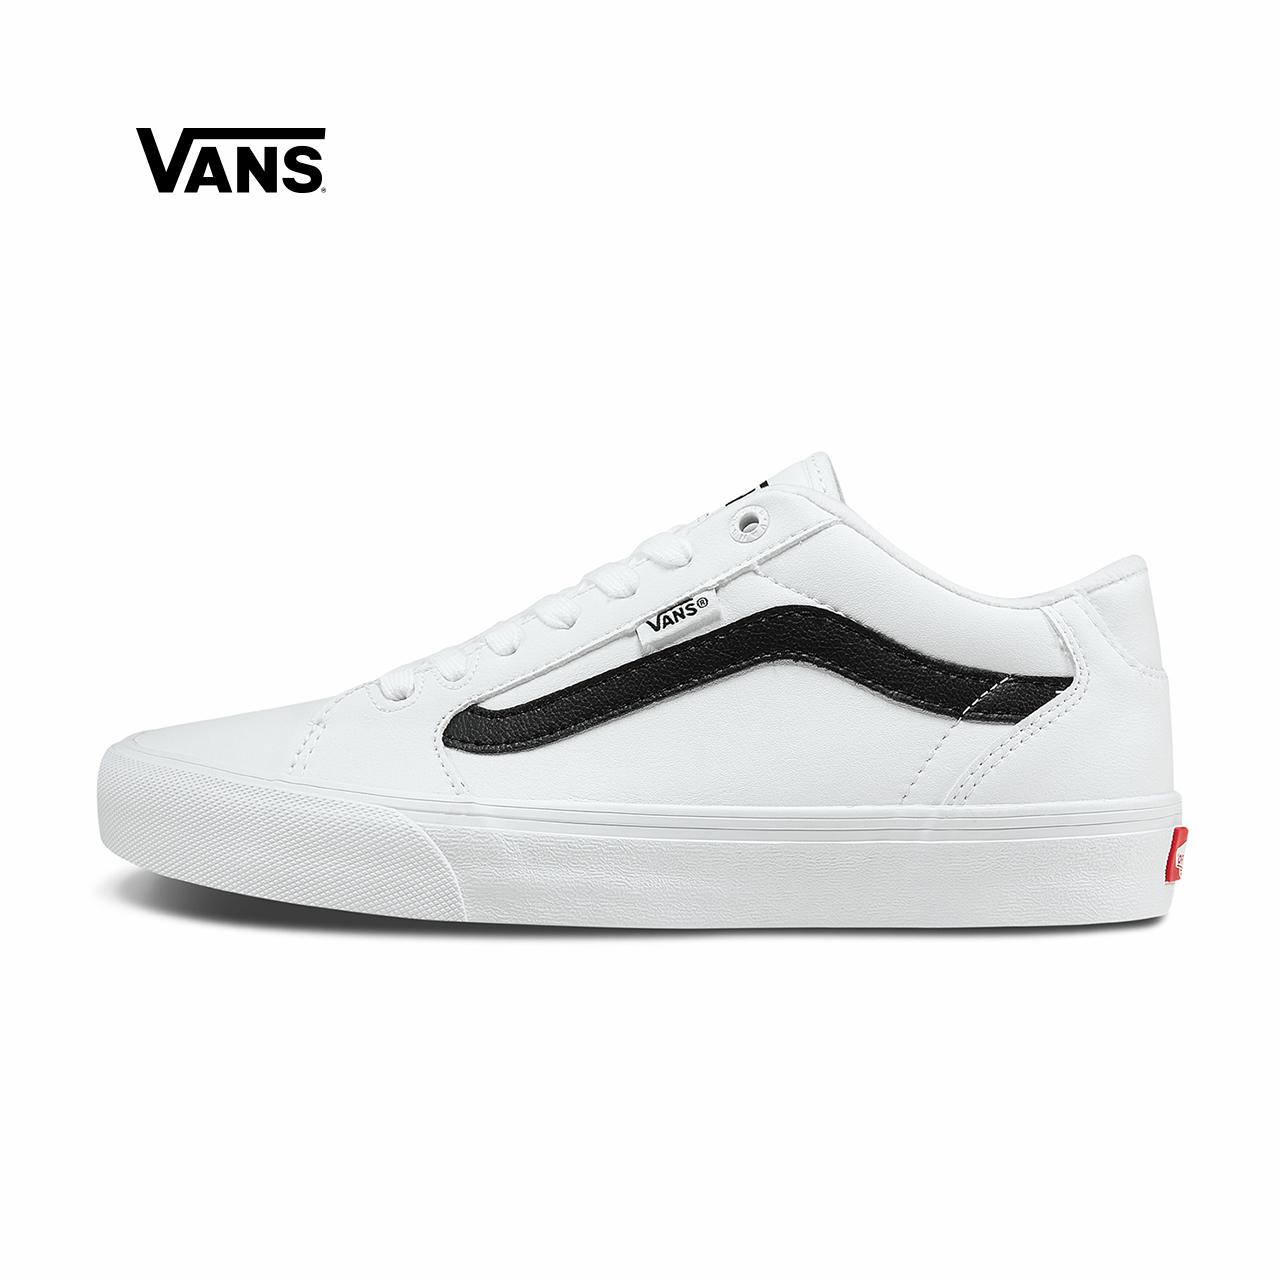 Vans范斯 运动休闲系列 运动鞋 低帮男子侧边条纹官方正品435.00元包邮